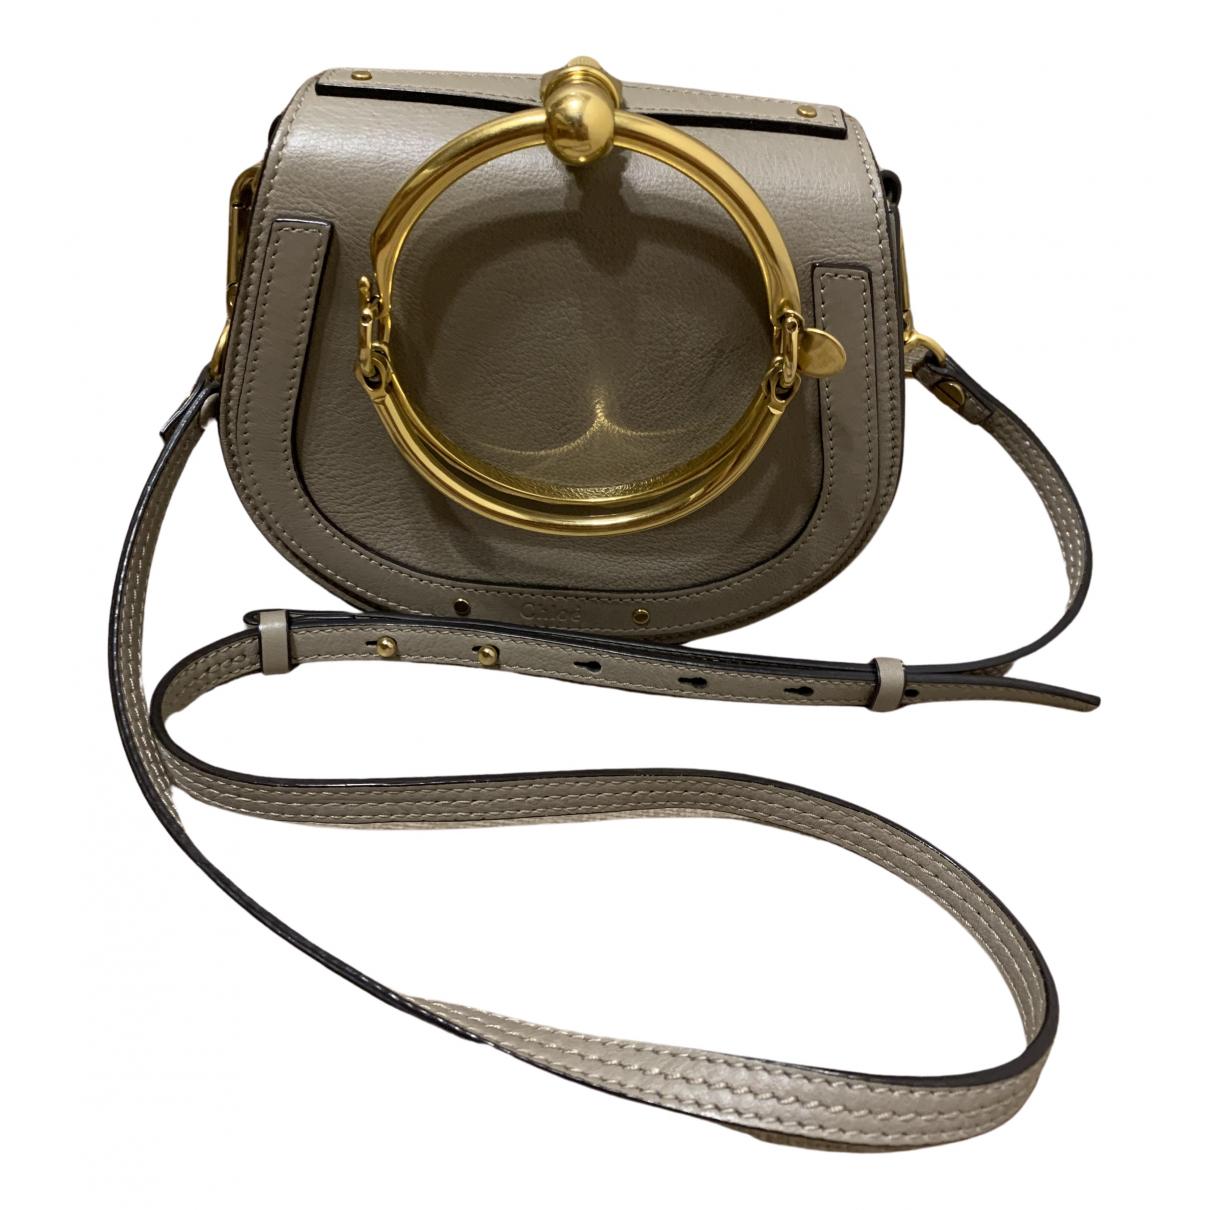 Chloé Bracelet Nile Grey Leather handbag for Women N